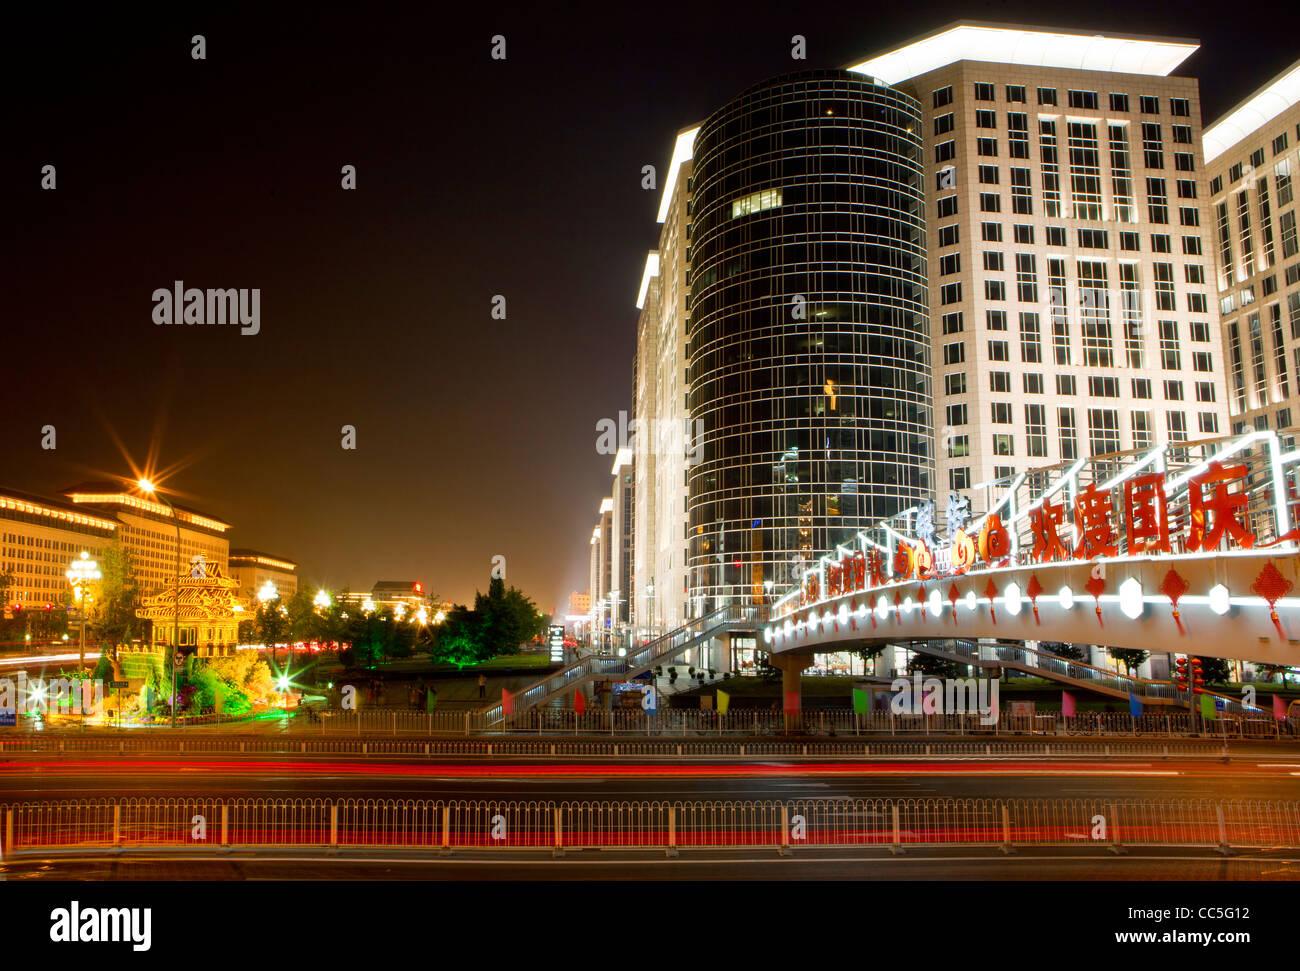 Por la noche la plaza oriental, Beijing, China Imagen De Stock